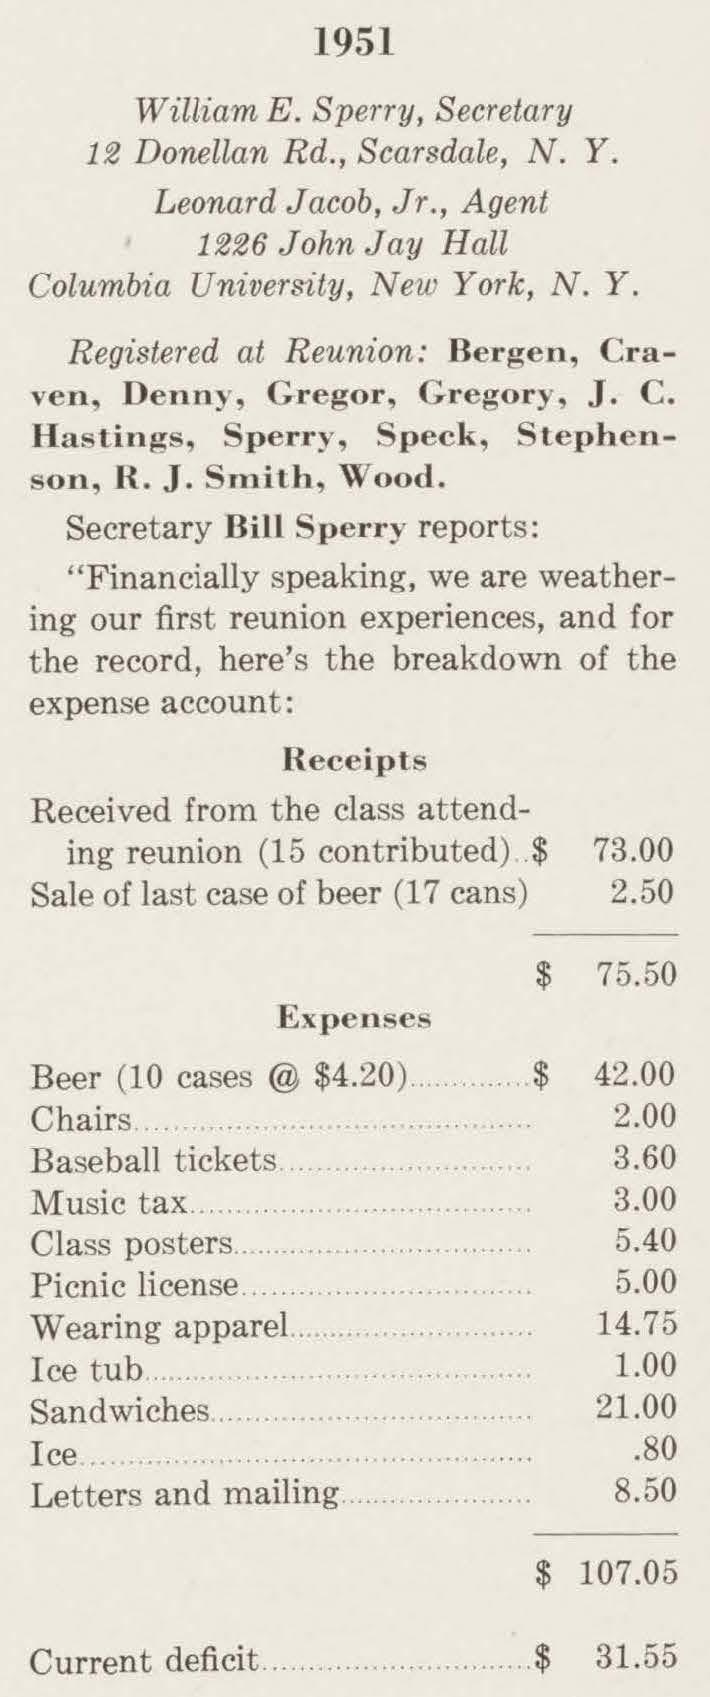 Alumni Review 1952 07 - 1951 1st reunion expense breakdown